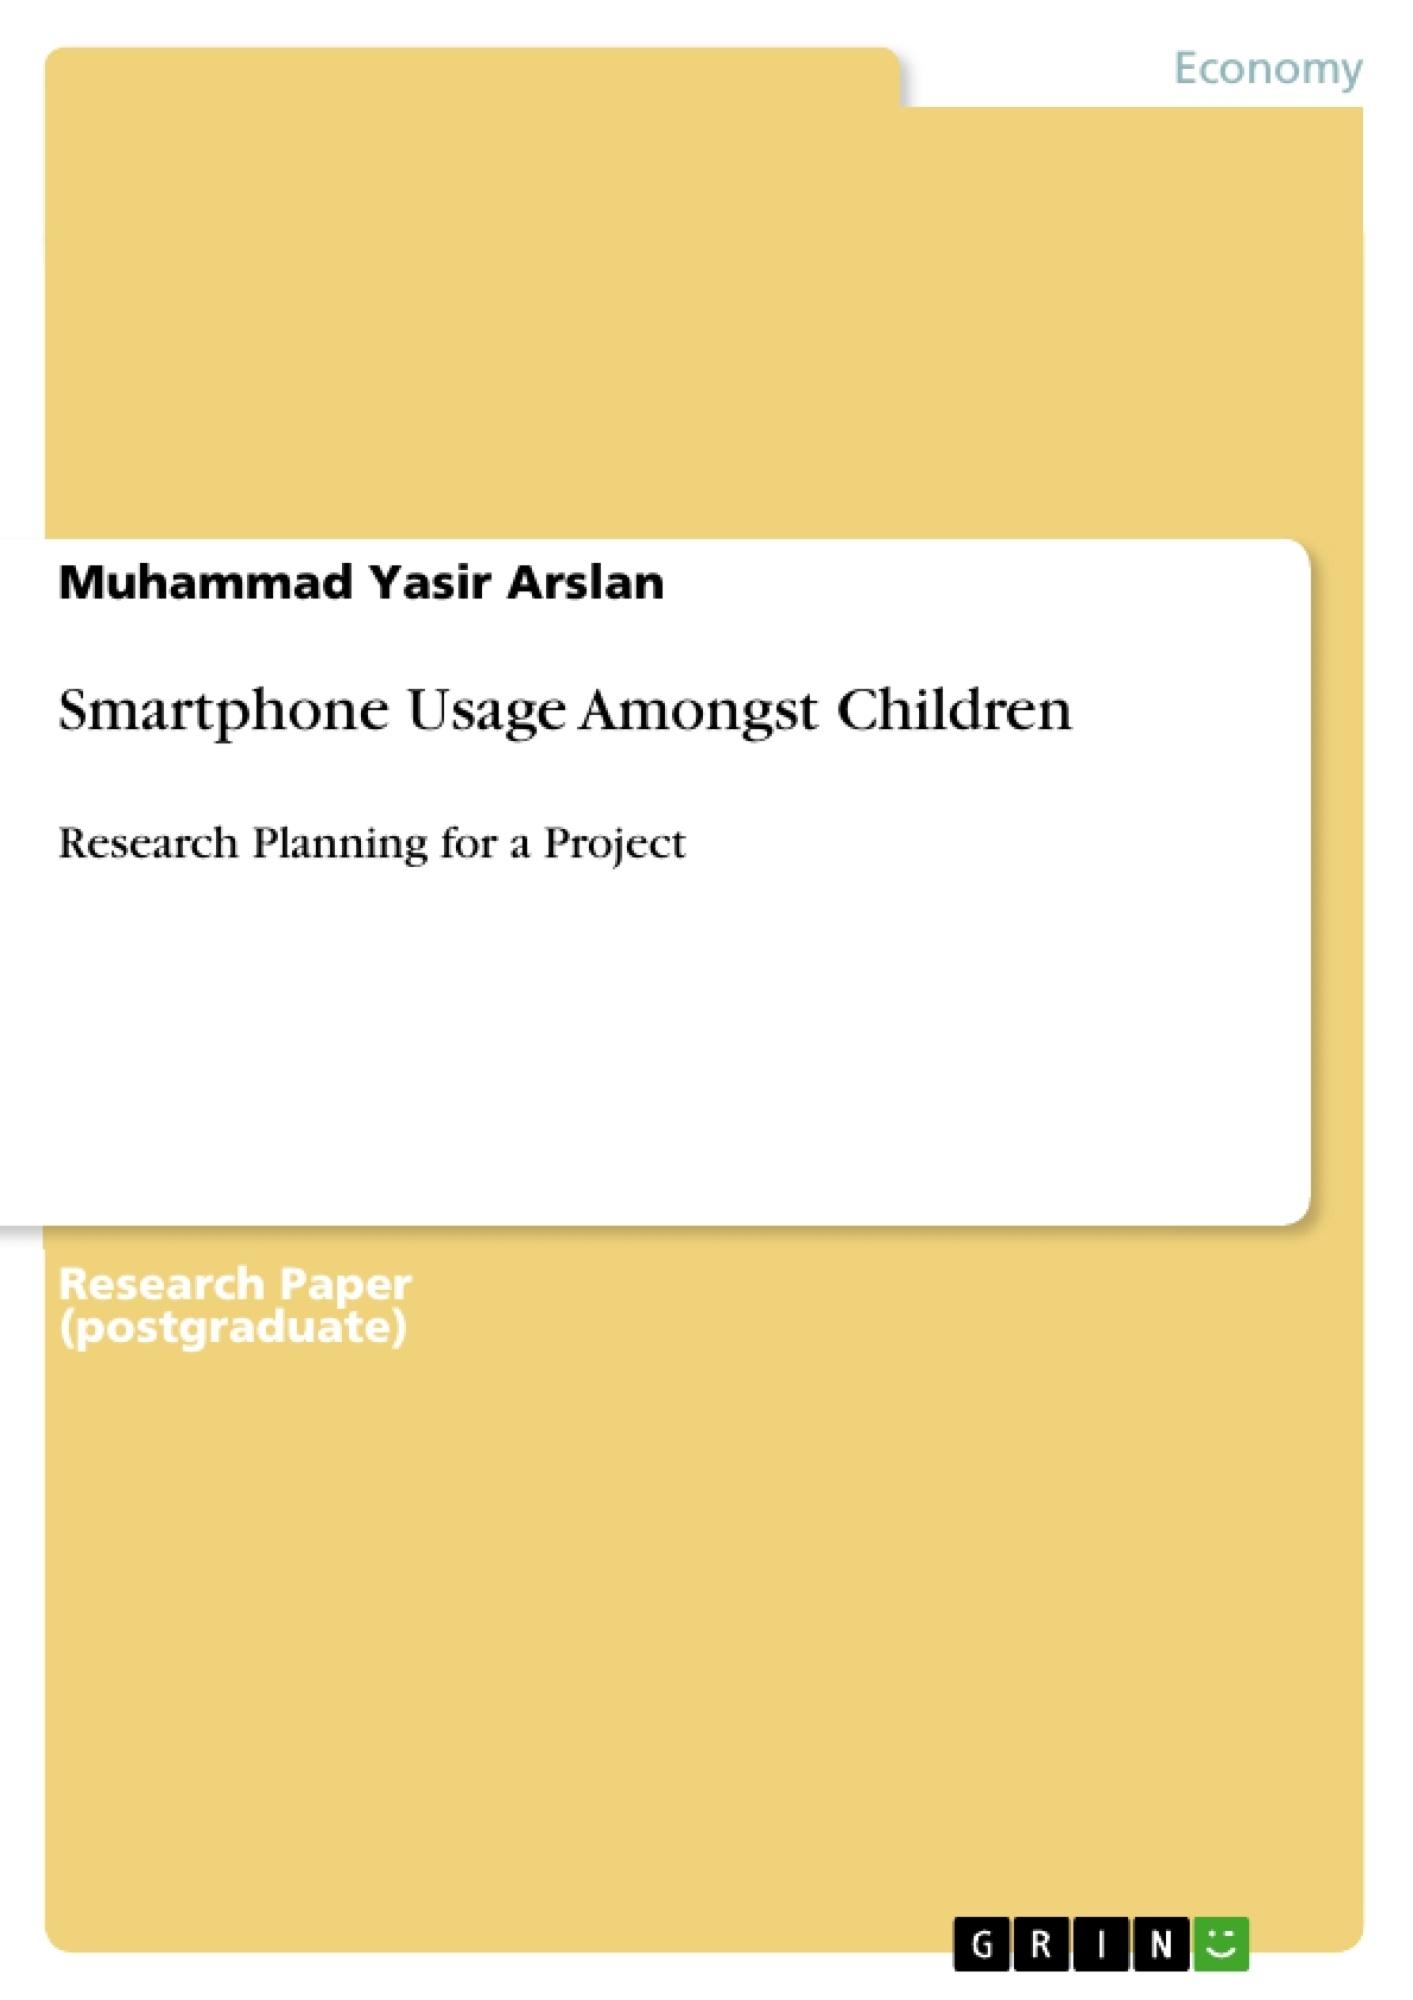 Title: Smartphone Usage Amongst Children